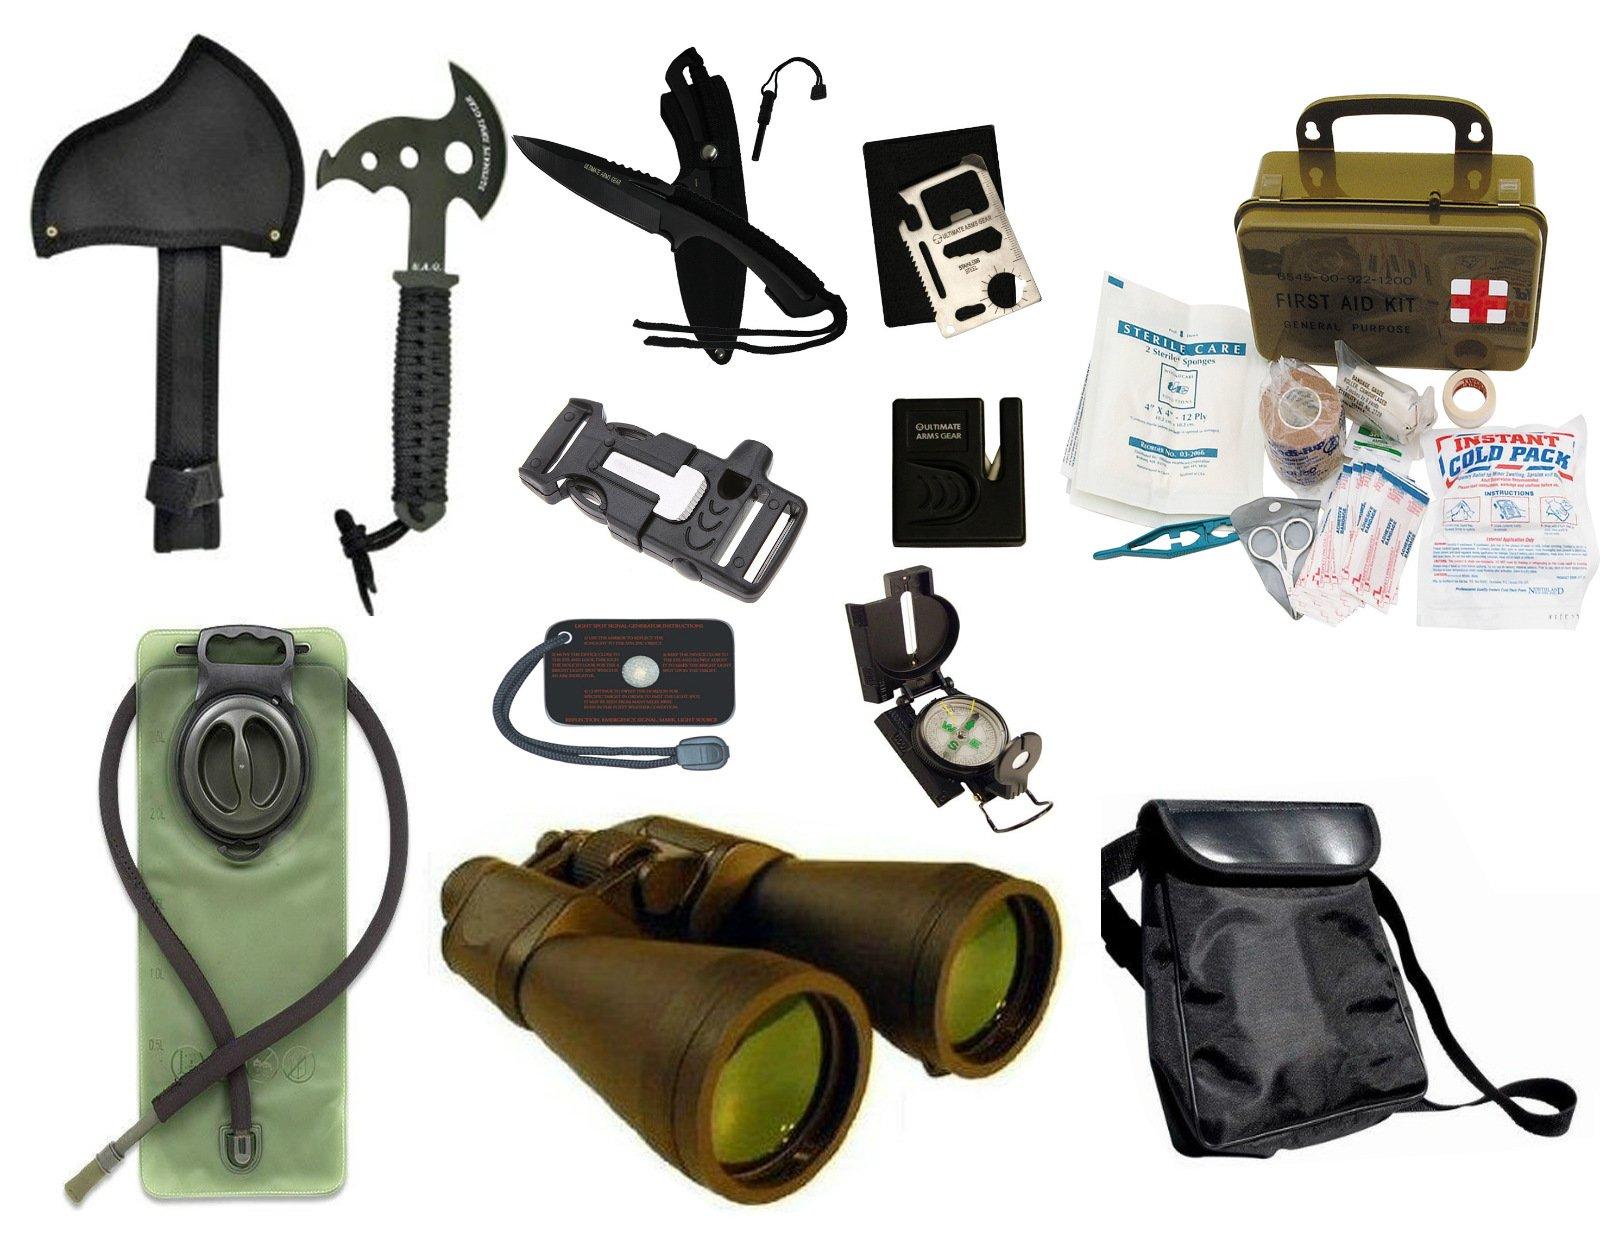 Survival Camping Hiking 20X70 Binoculars Green,Emergency First Aid Kit, Sharpener, Axe, Fire Starter Blade, Whistle Flint Striker Belt Buckle, Hydration Bladder, Multi Tool, Compass, Signal Mirror